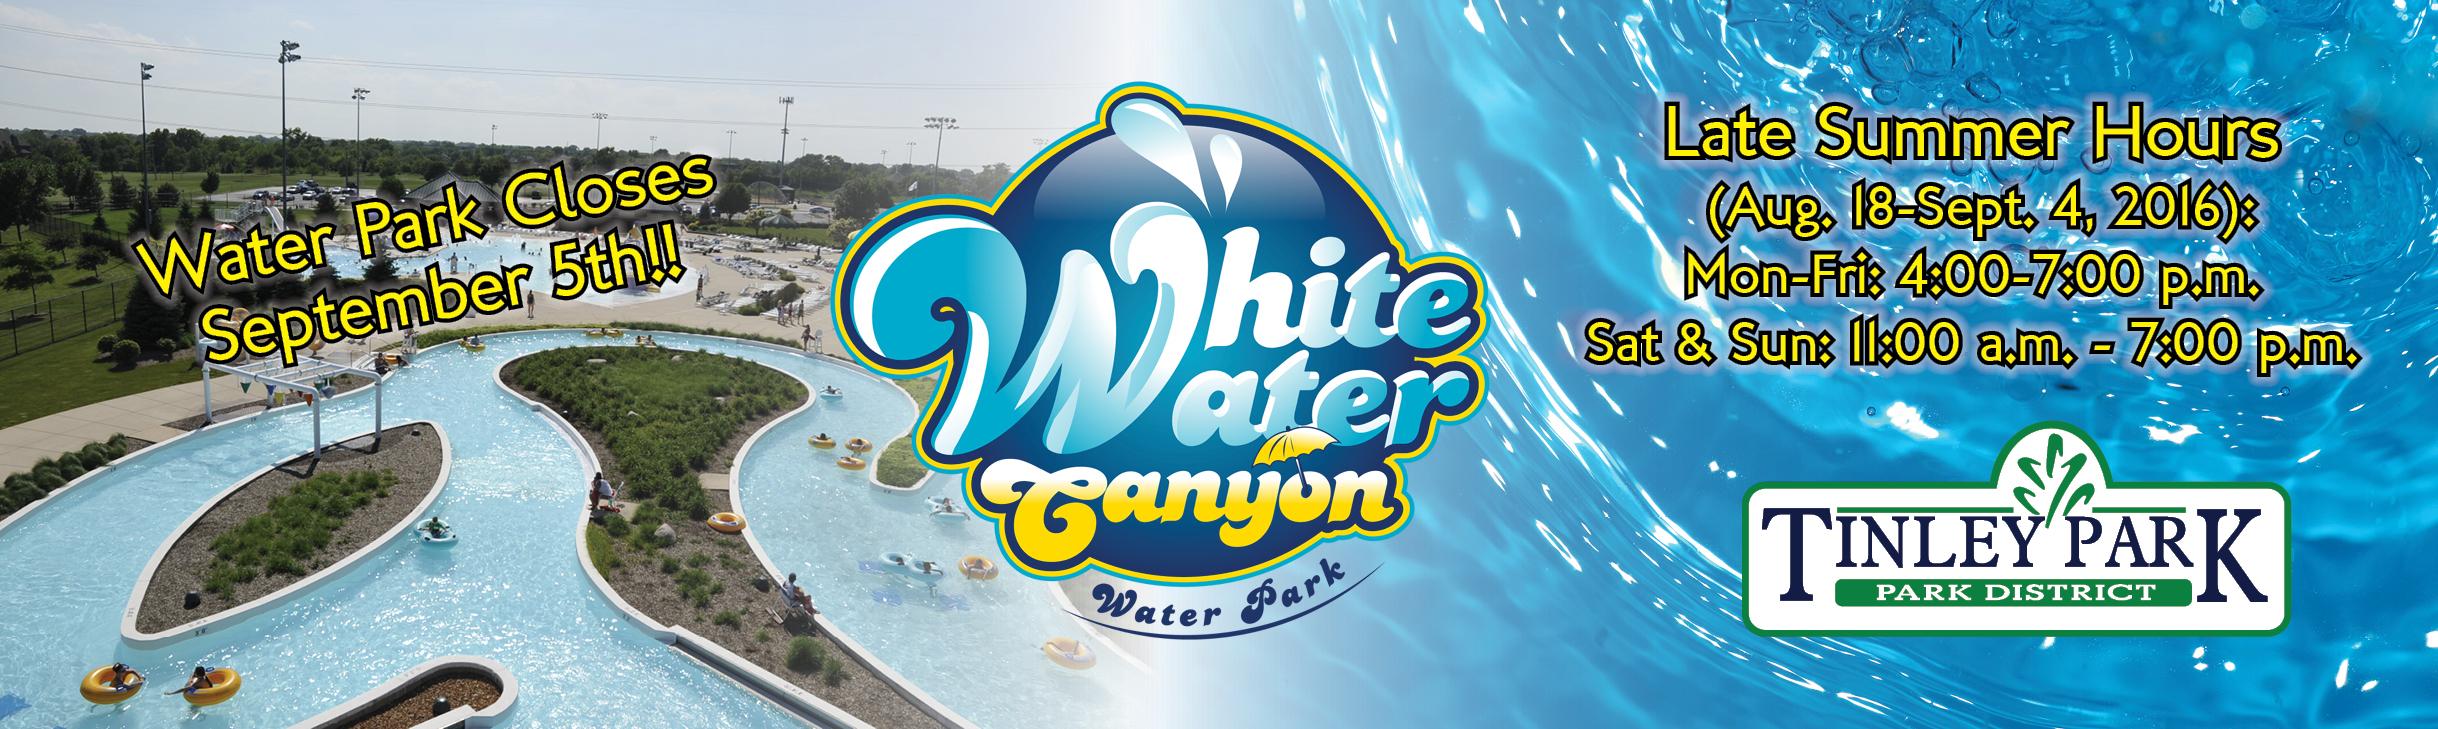 Web Banner Water Park